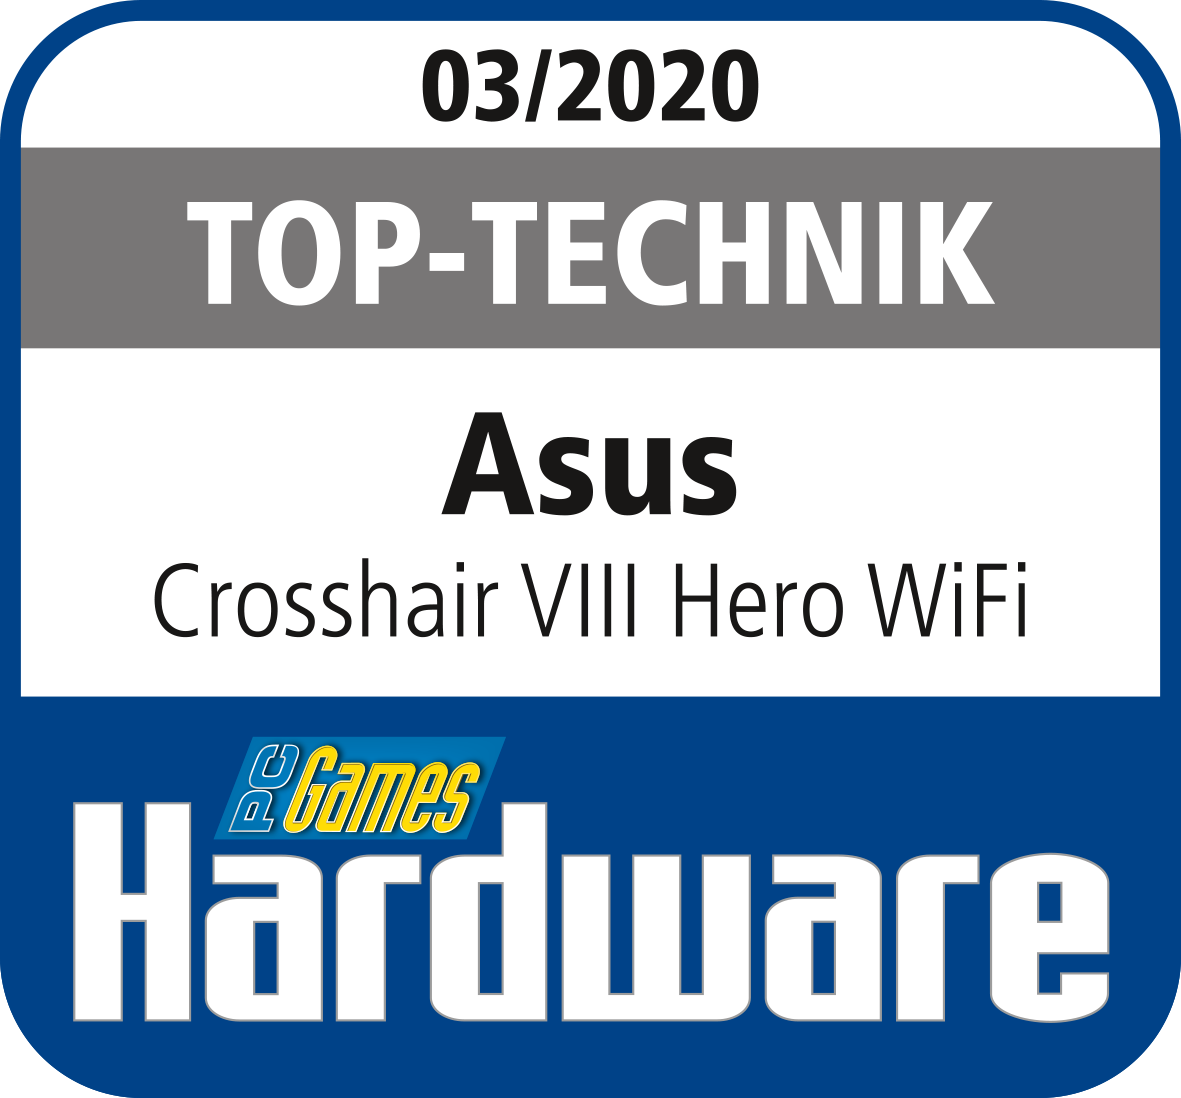 Top Technic